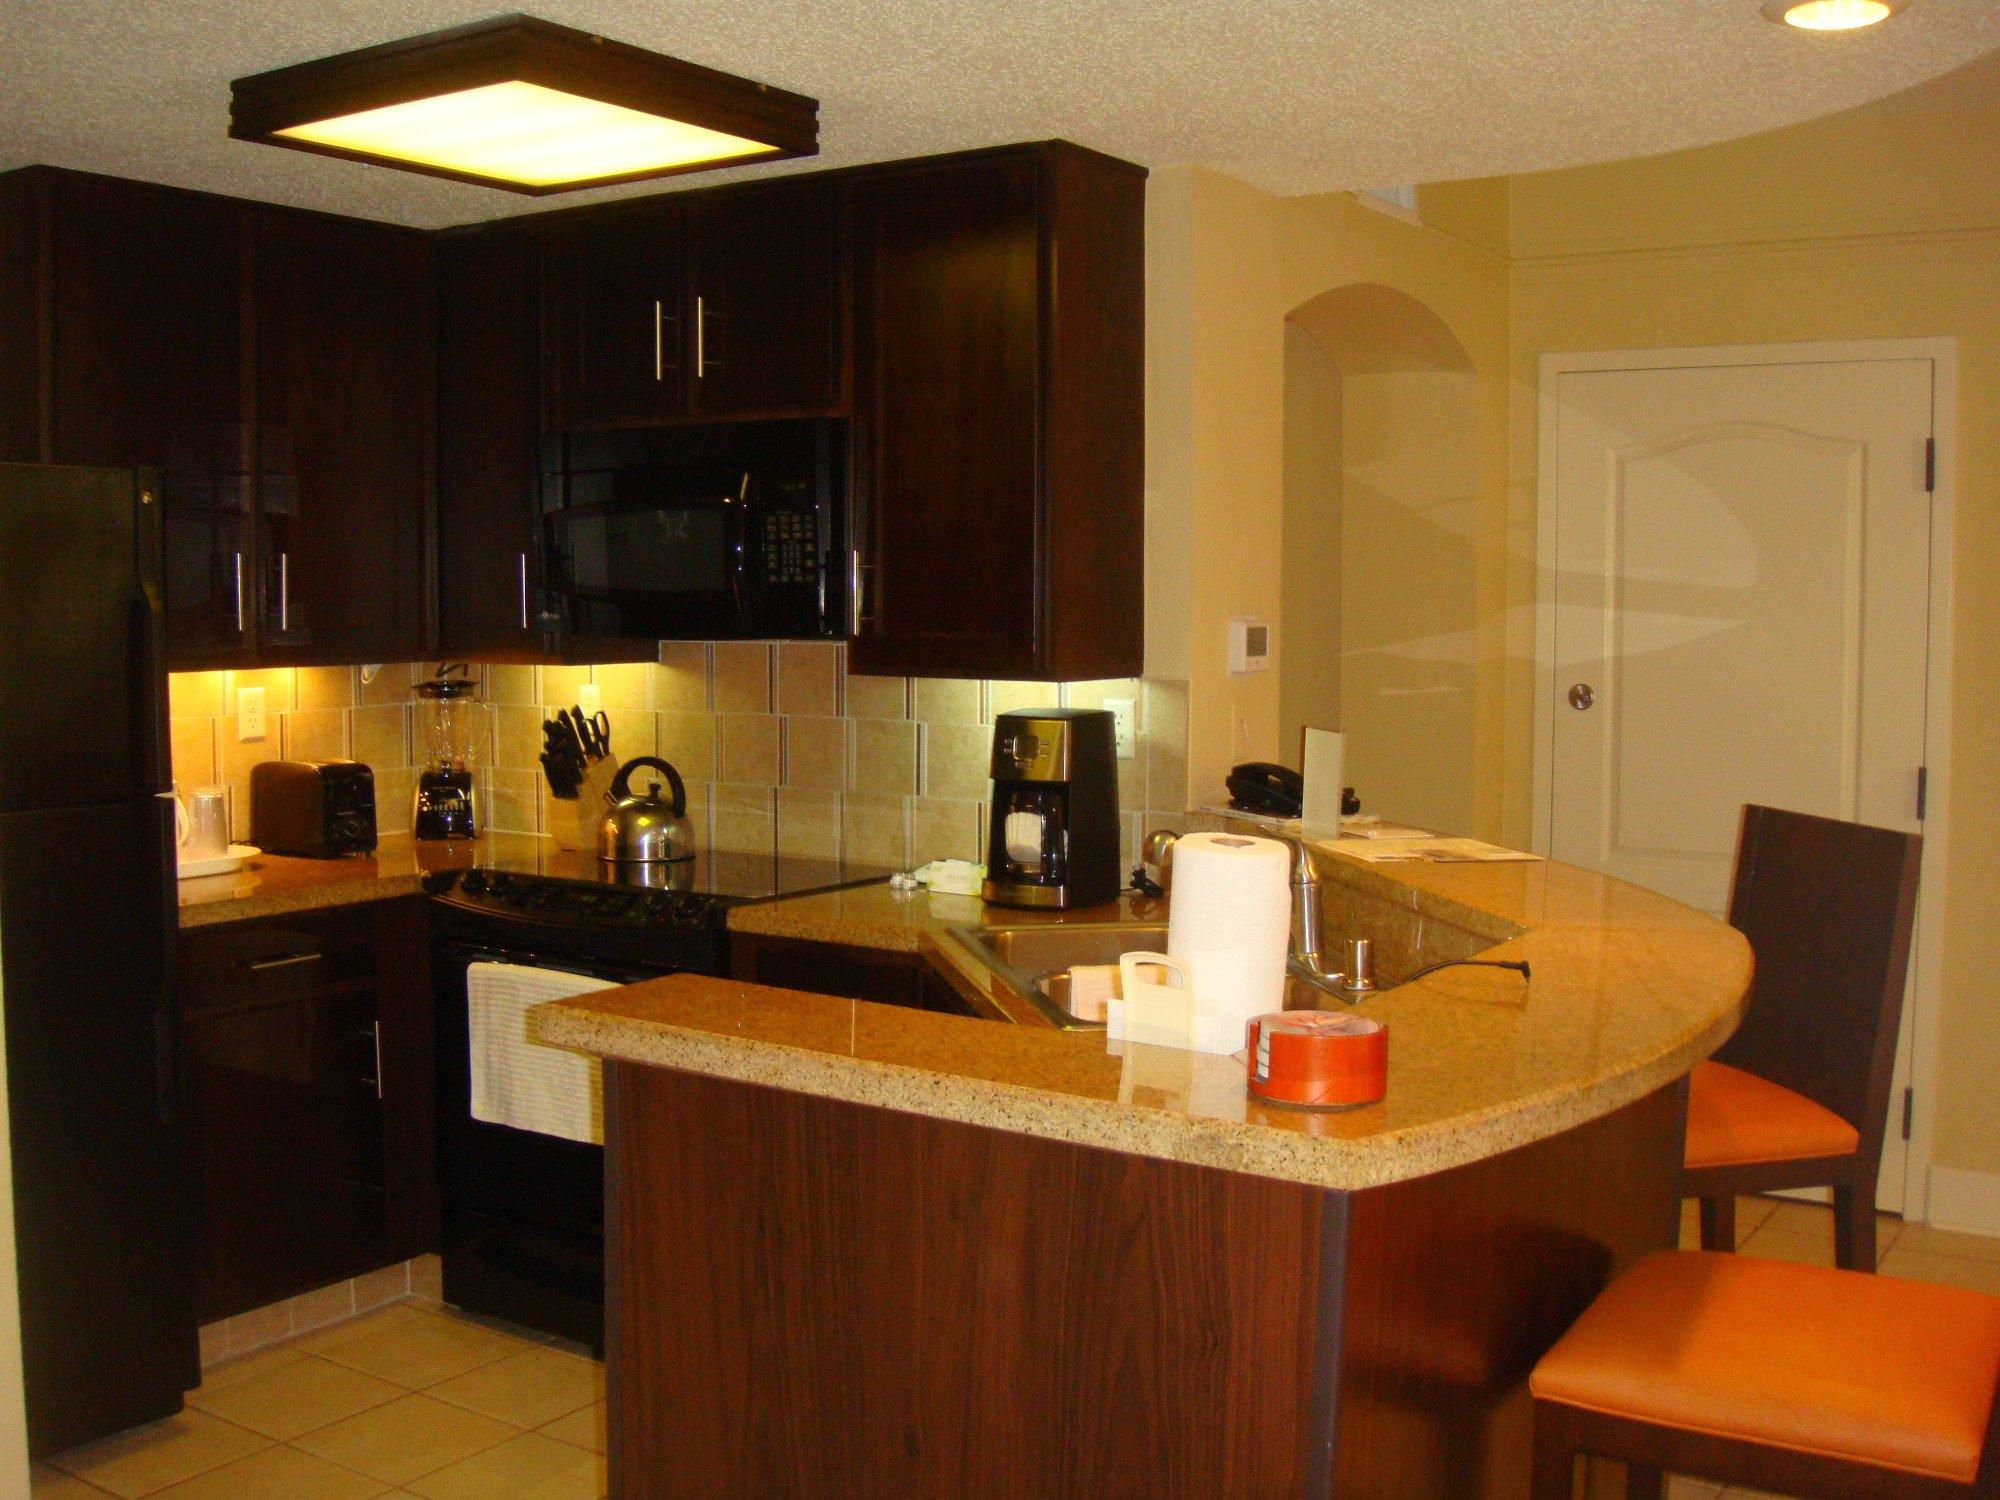 ordinary Aruba Hotels With Kitchens #3: Aruba Hotels With Kitchens Zitzat